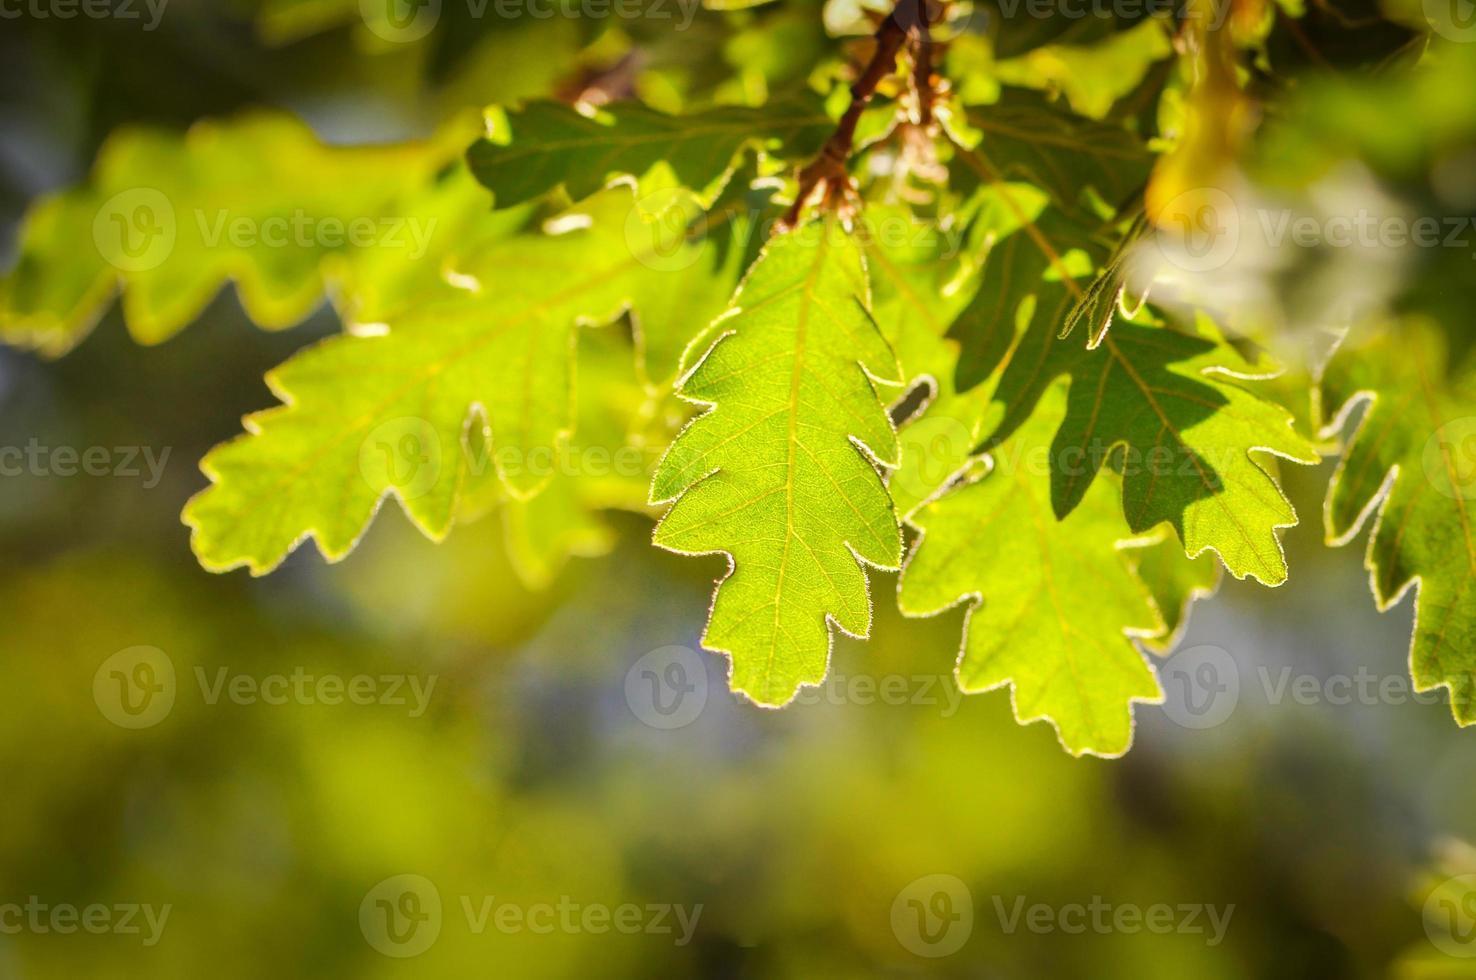 Hojas de roble verde fresco sobre un fondo borroso foto